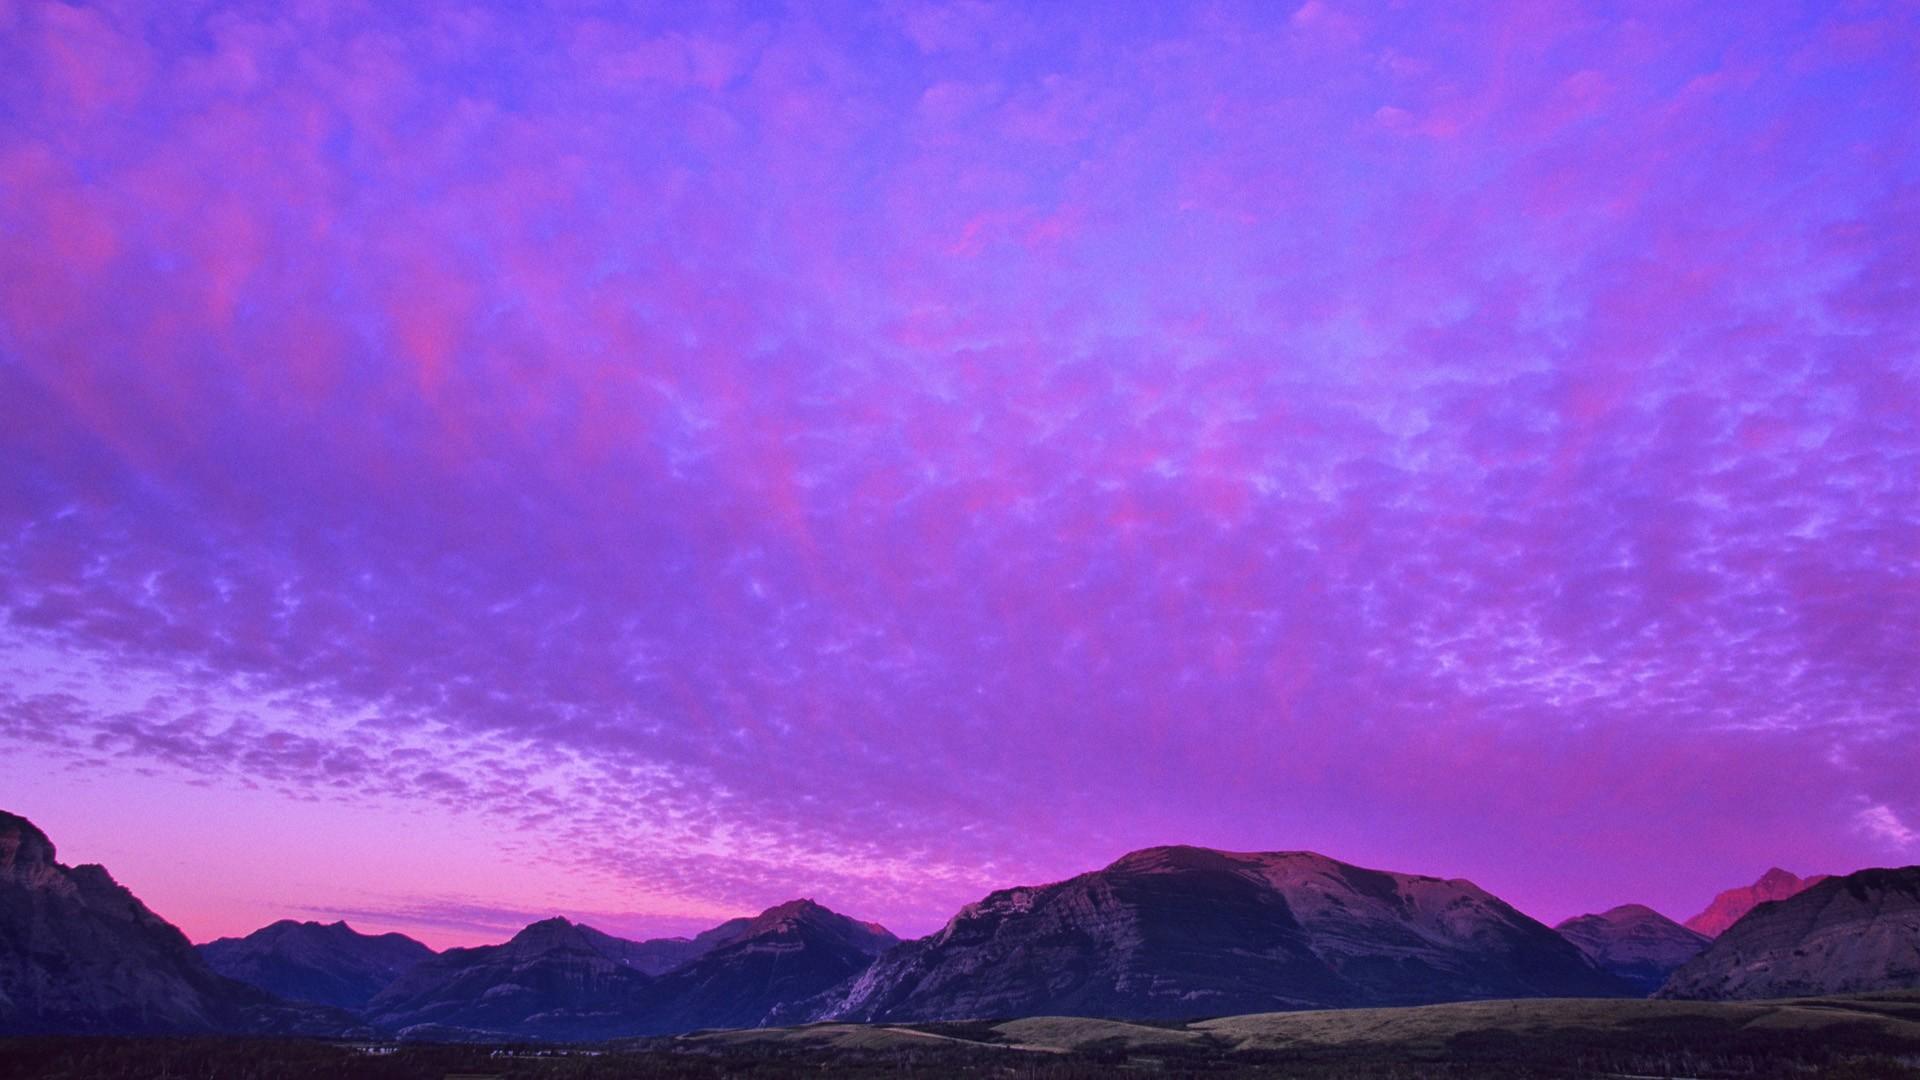 Purple Sky Wallpaper Picture hd